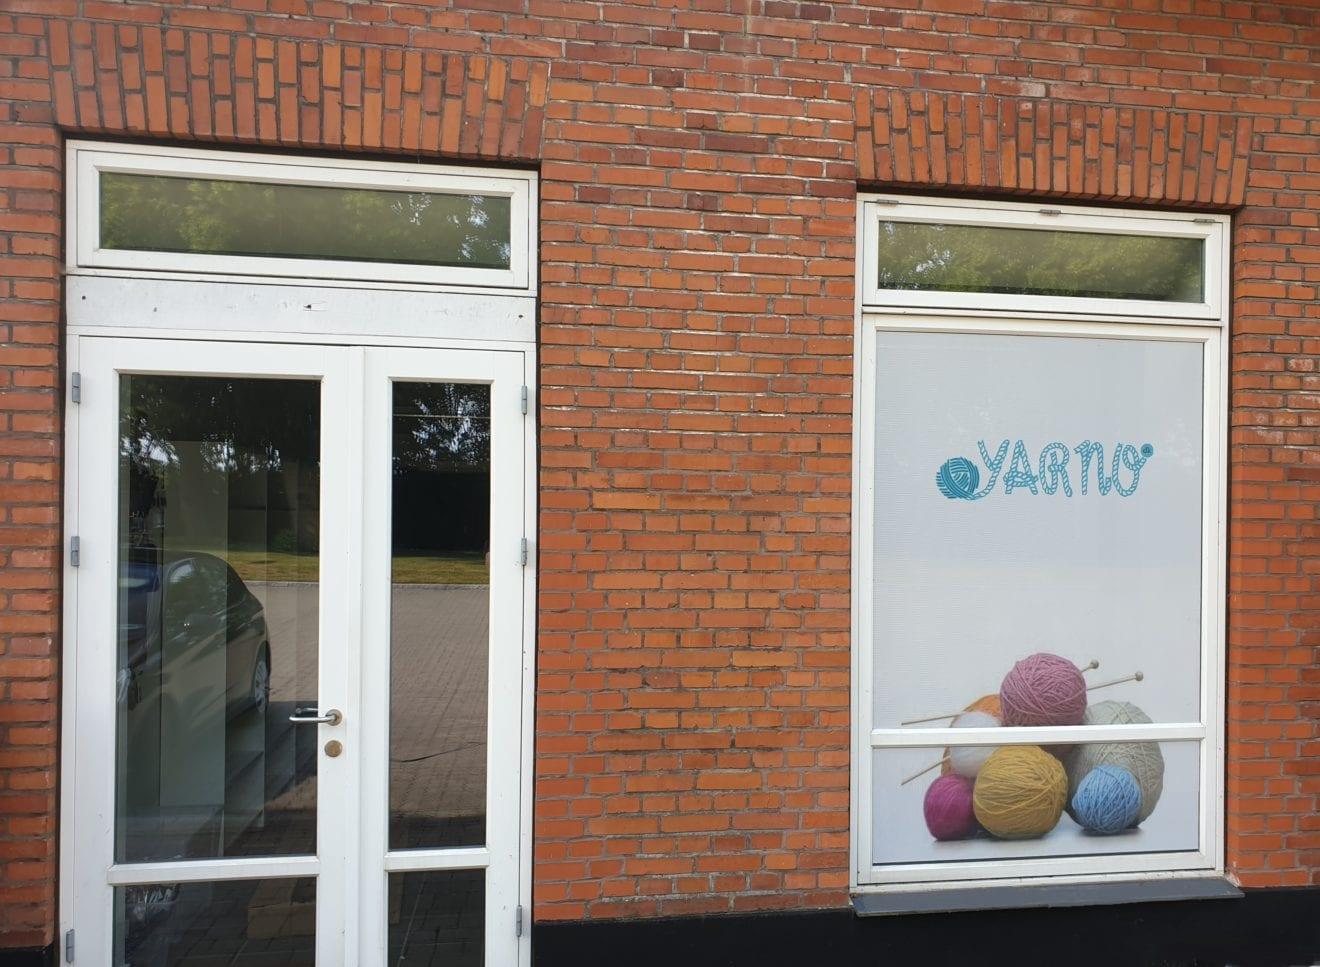 Online garnbutik åbner fysisk butik